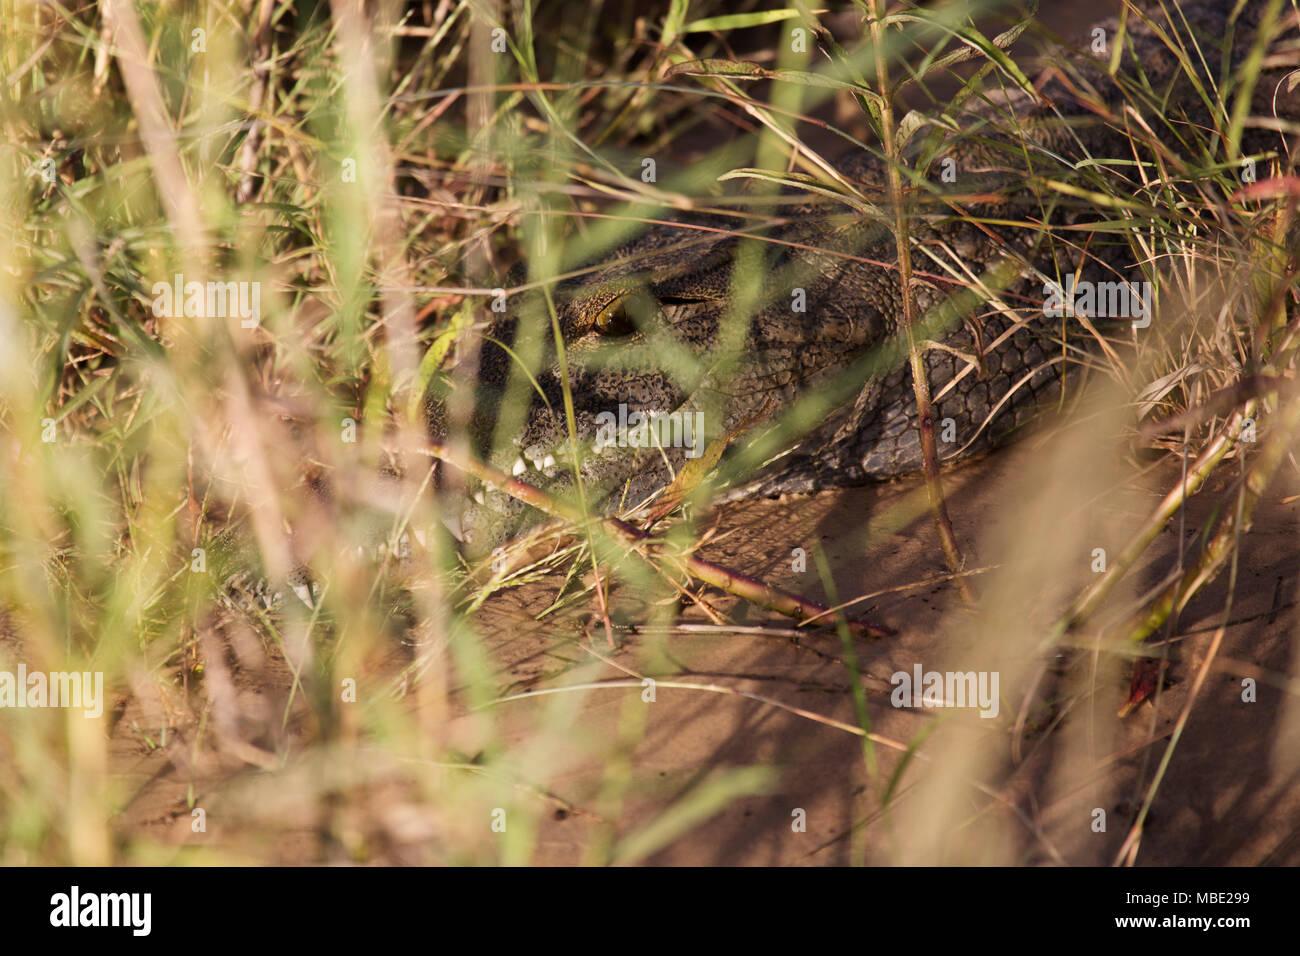 Crocodile among reeds on the banks of the Zambezi River near Victoria Falls in Zimbabwe. The croc (Crocodylus niloticus) peeks through the reeds. - Stock Image